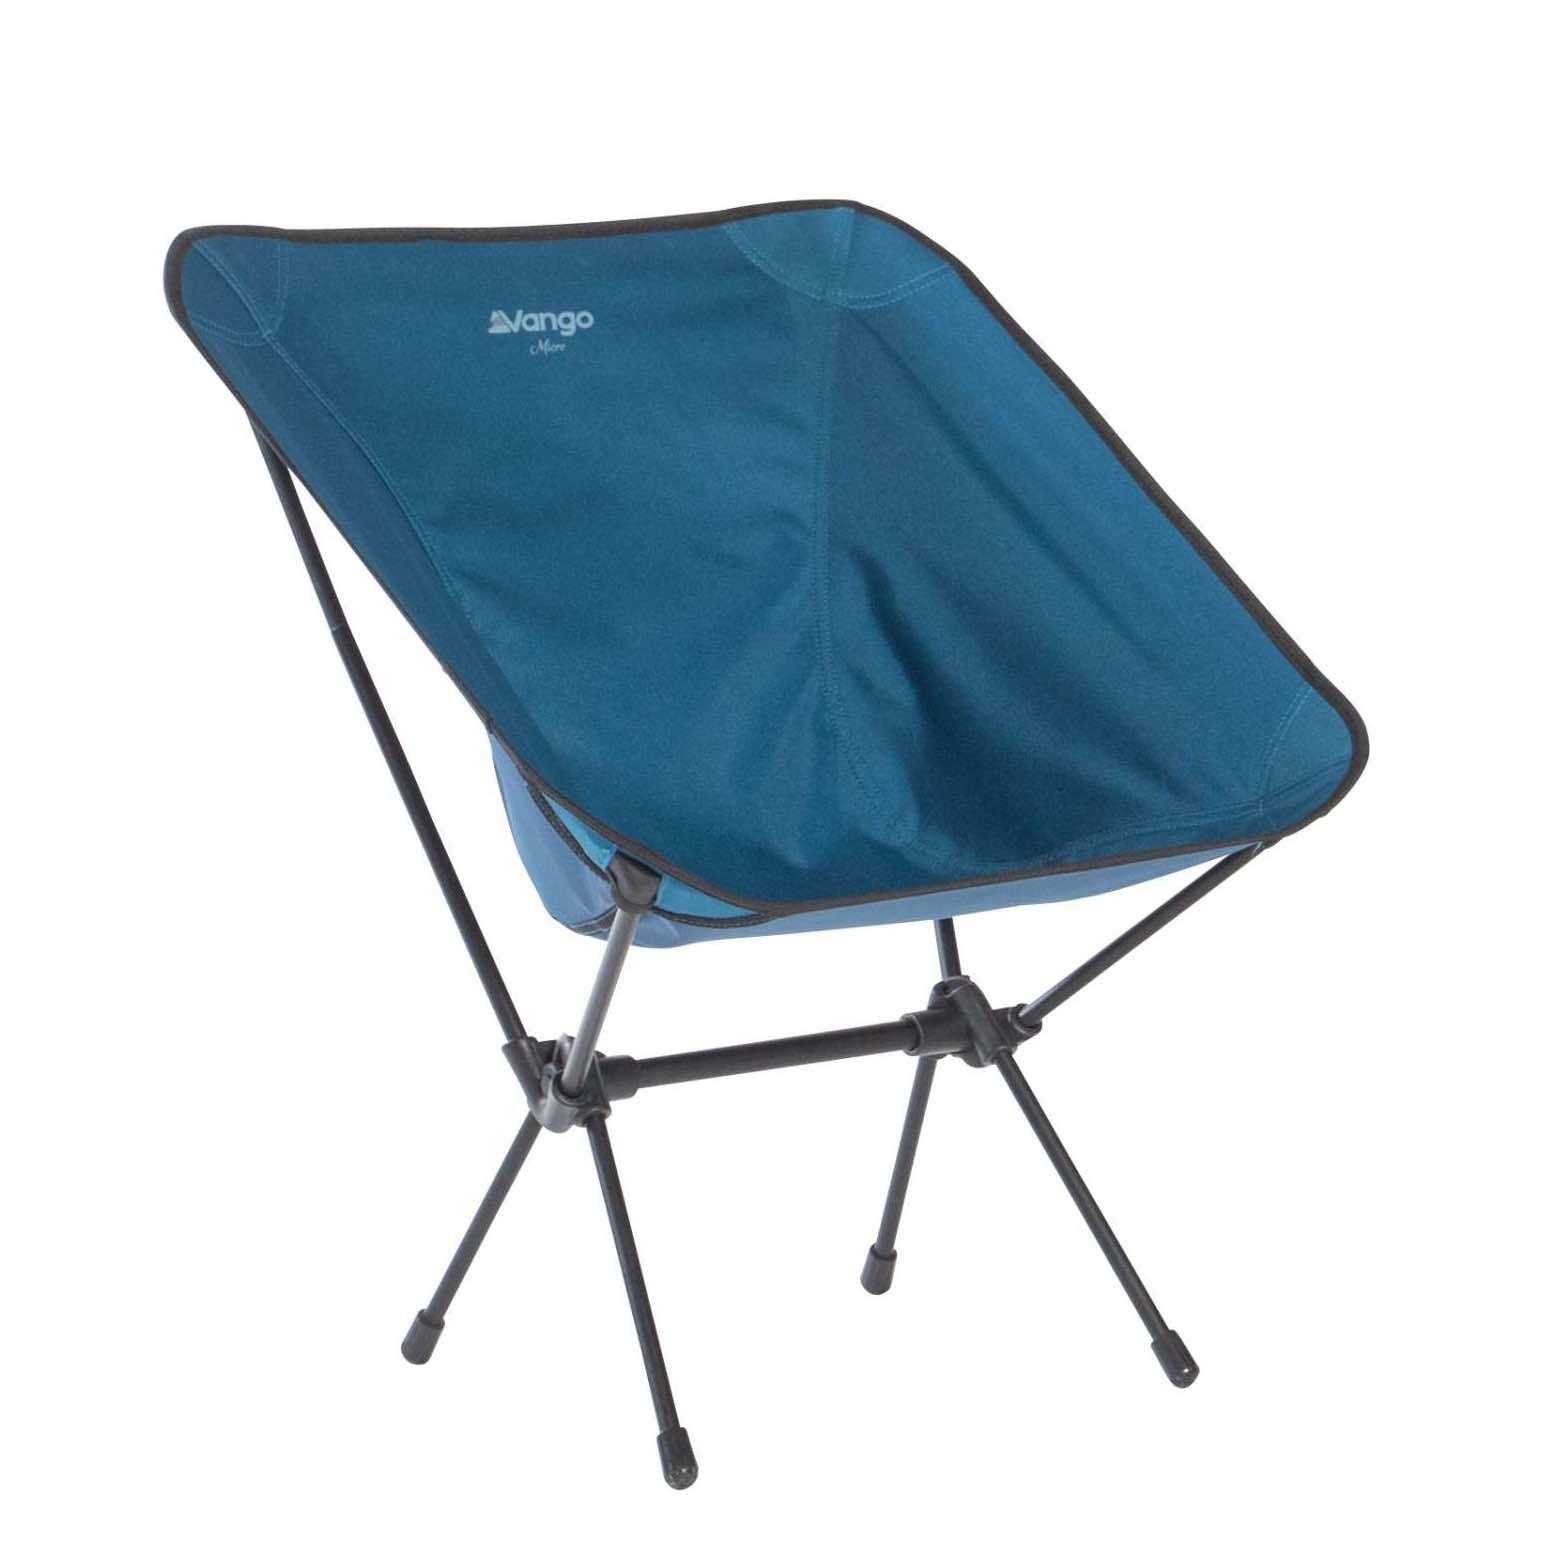 Vango Micro Steel Stuhl